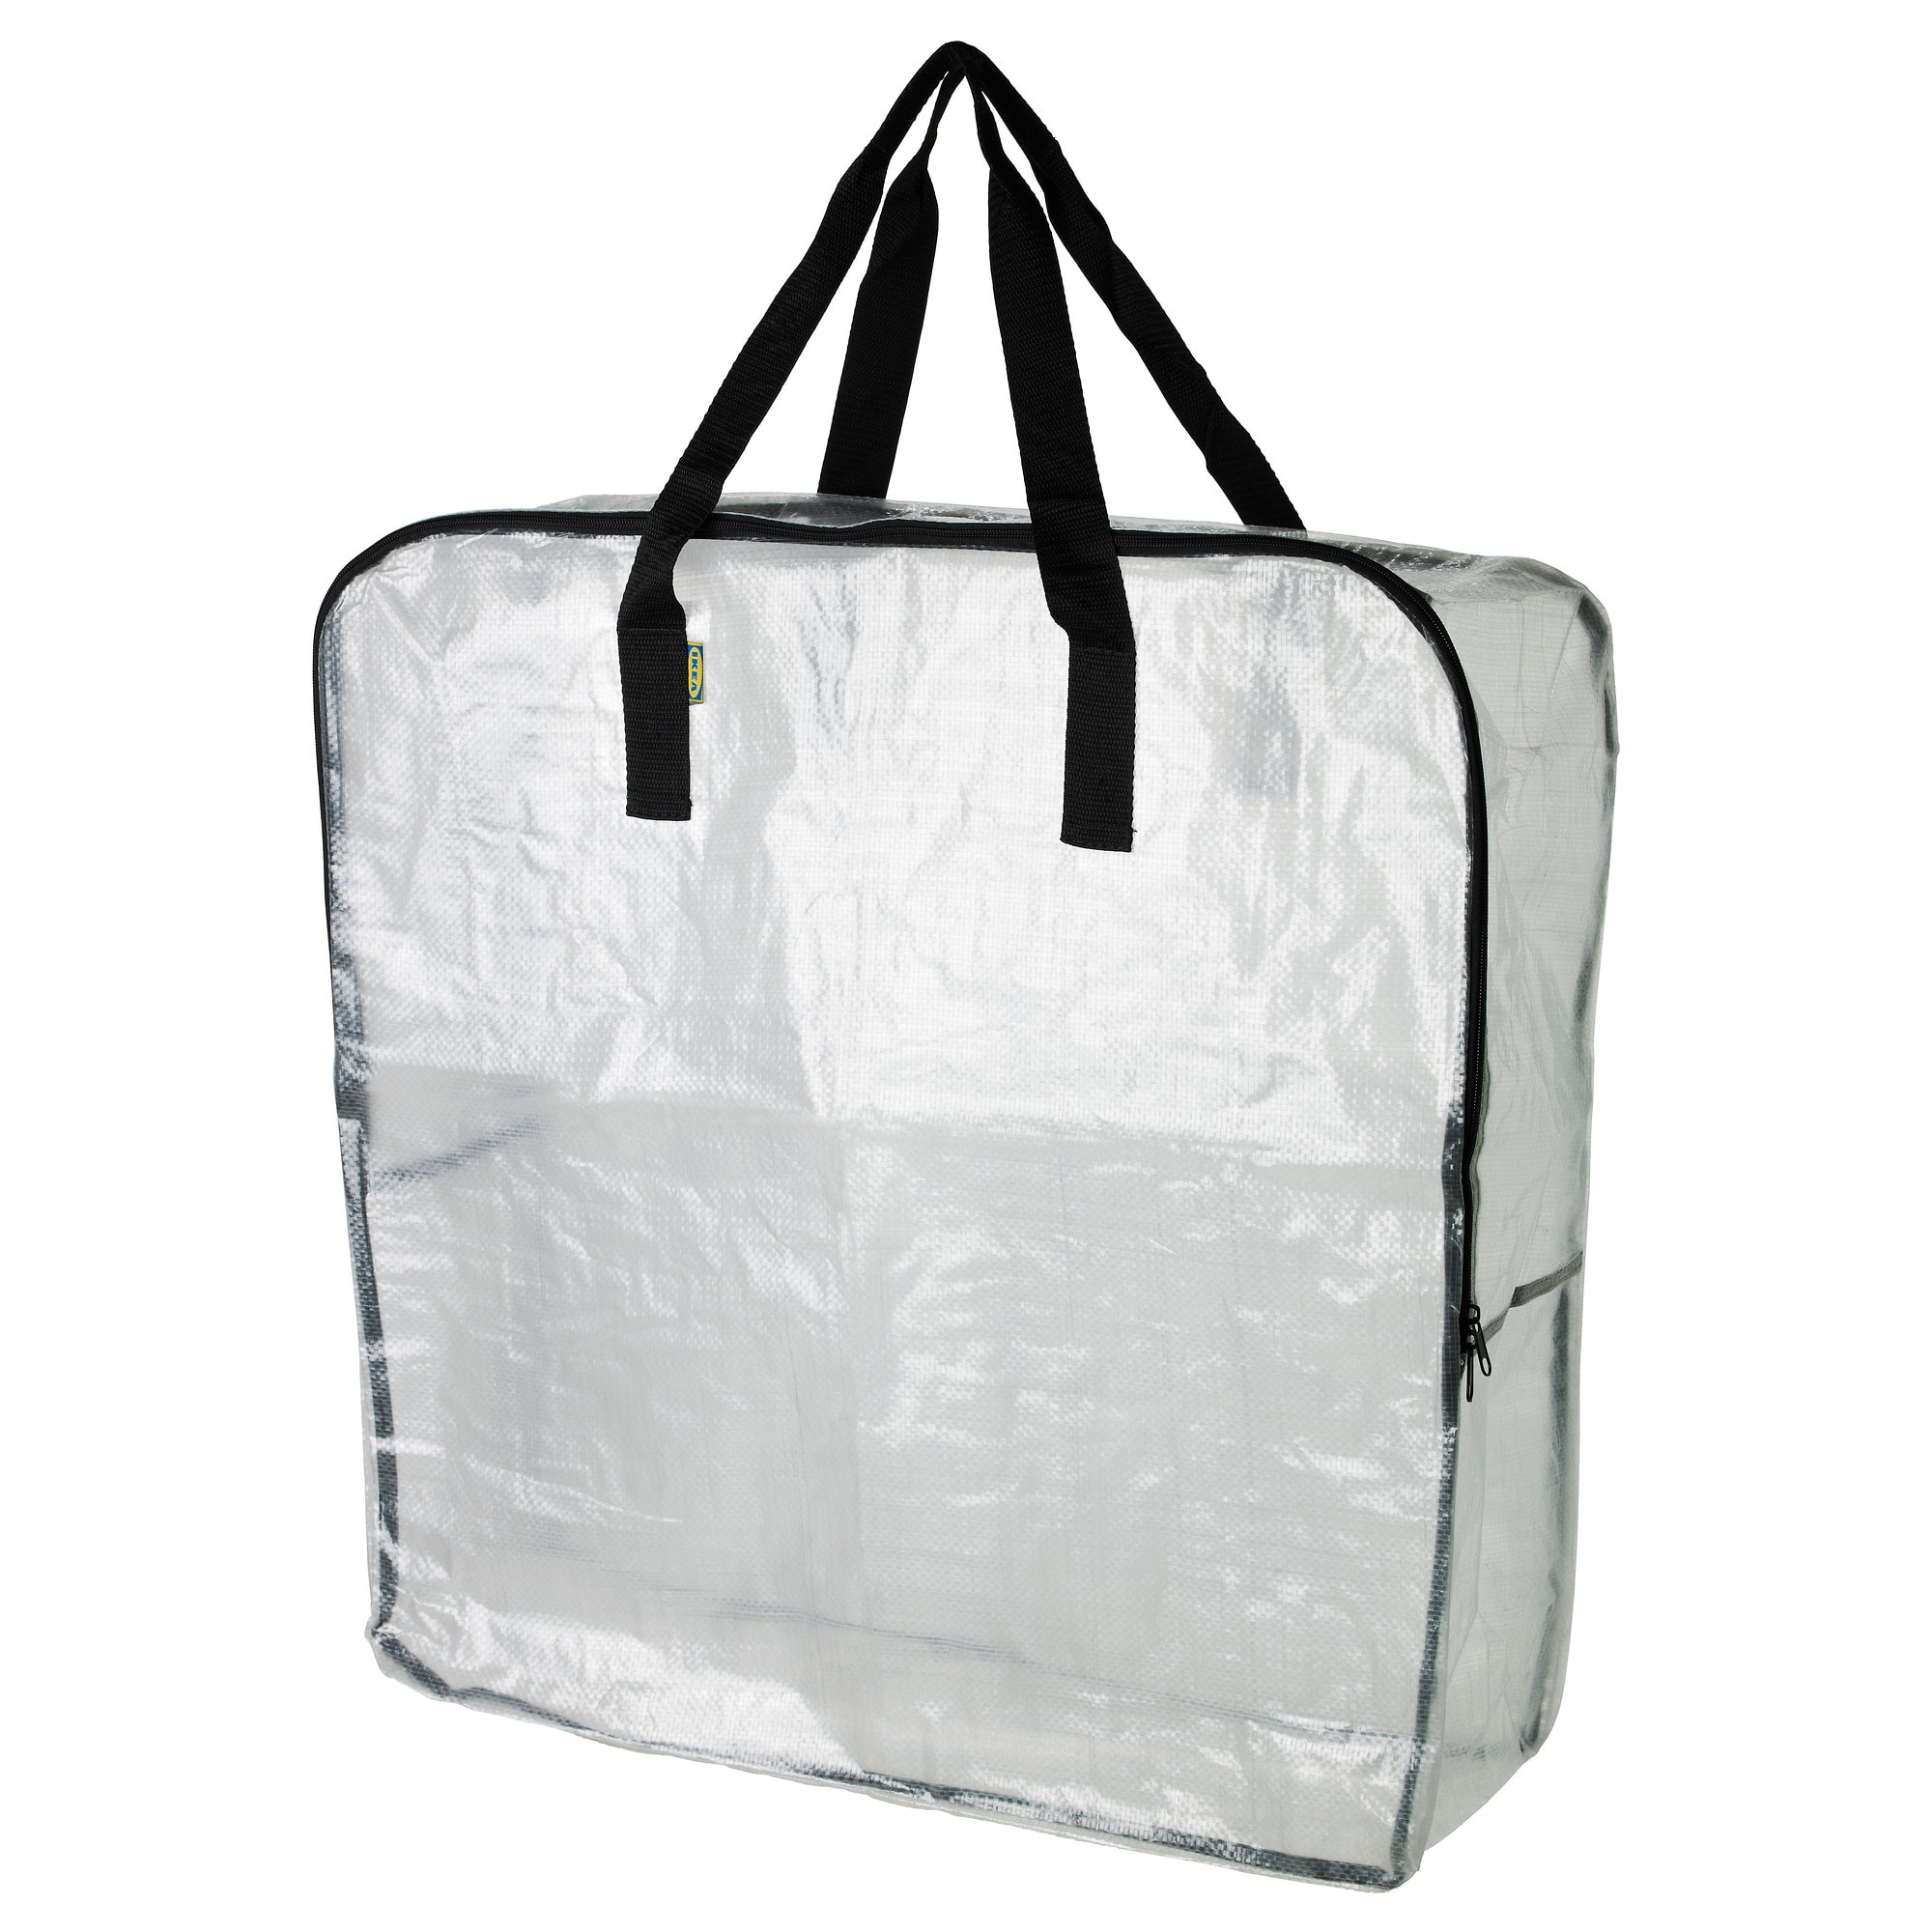 Dimpa Storage Bag Clear 25 ½x8 ¾x25 ½